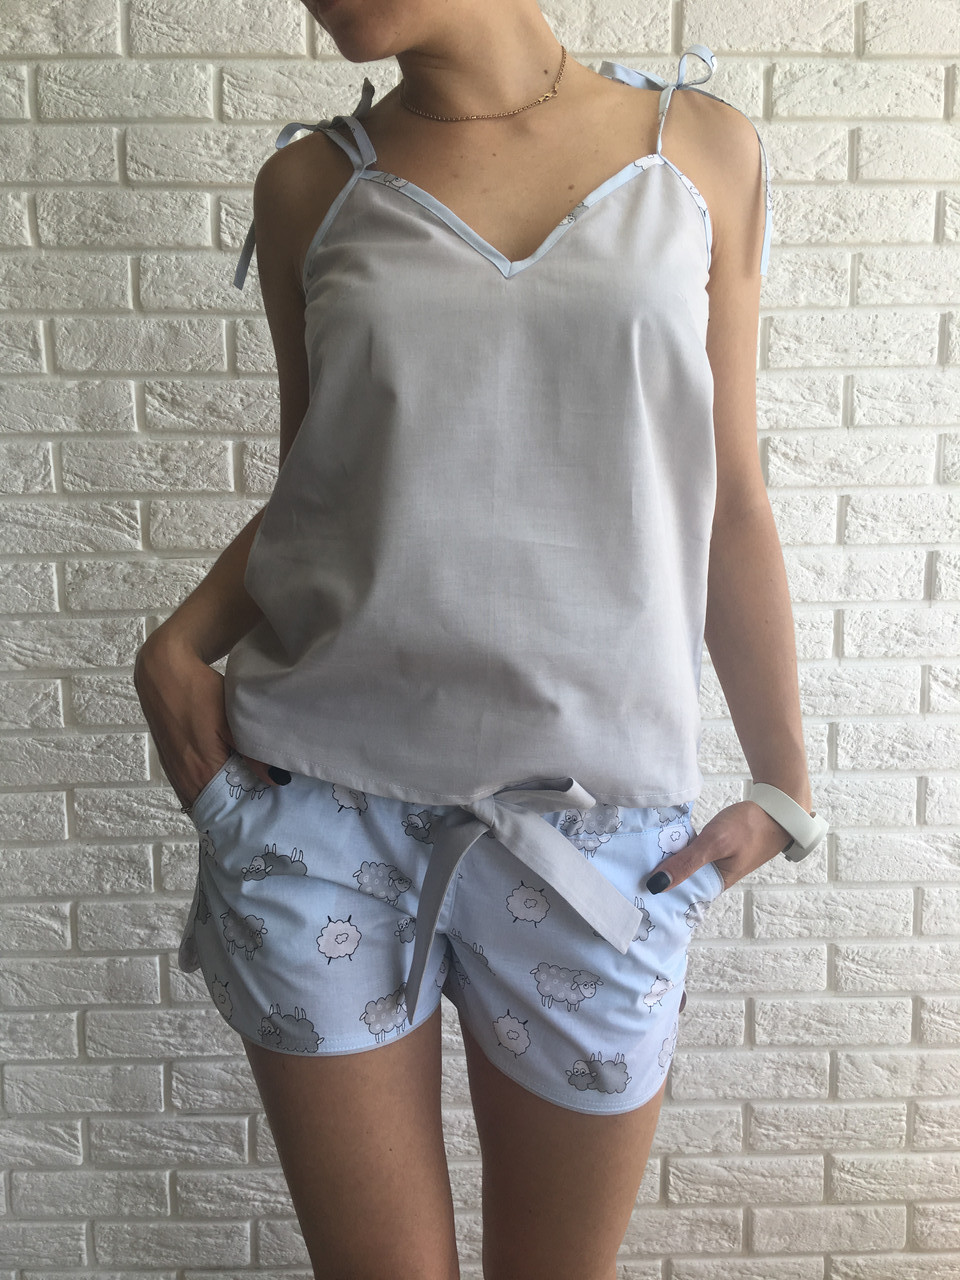 a5133bd4fac Женская летняя пижама с шортами «Пижама пати» S M - Интернет магазин  BuyPlace.com